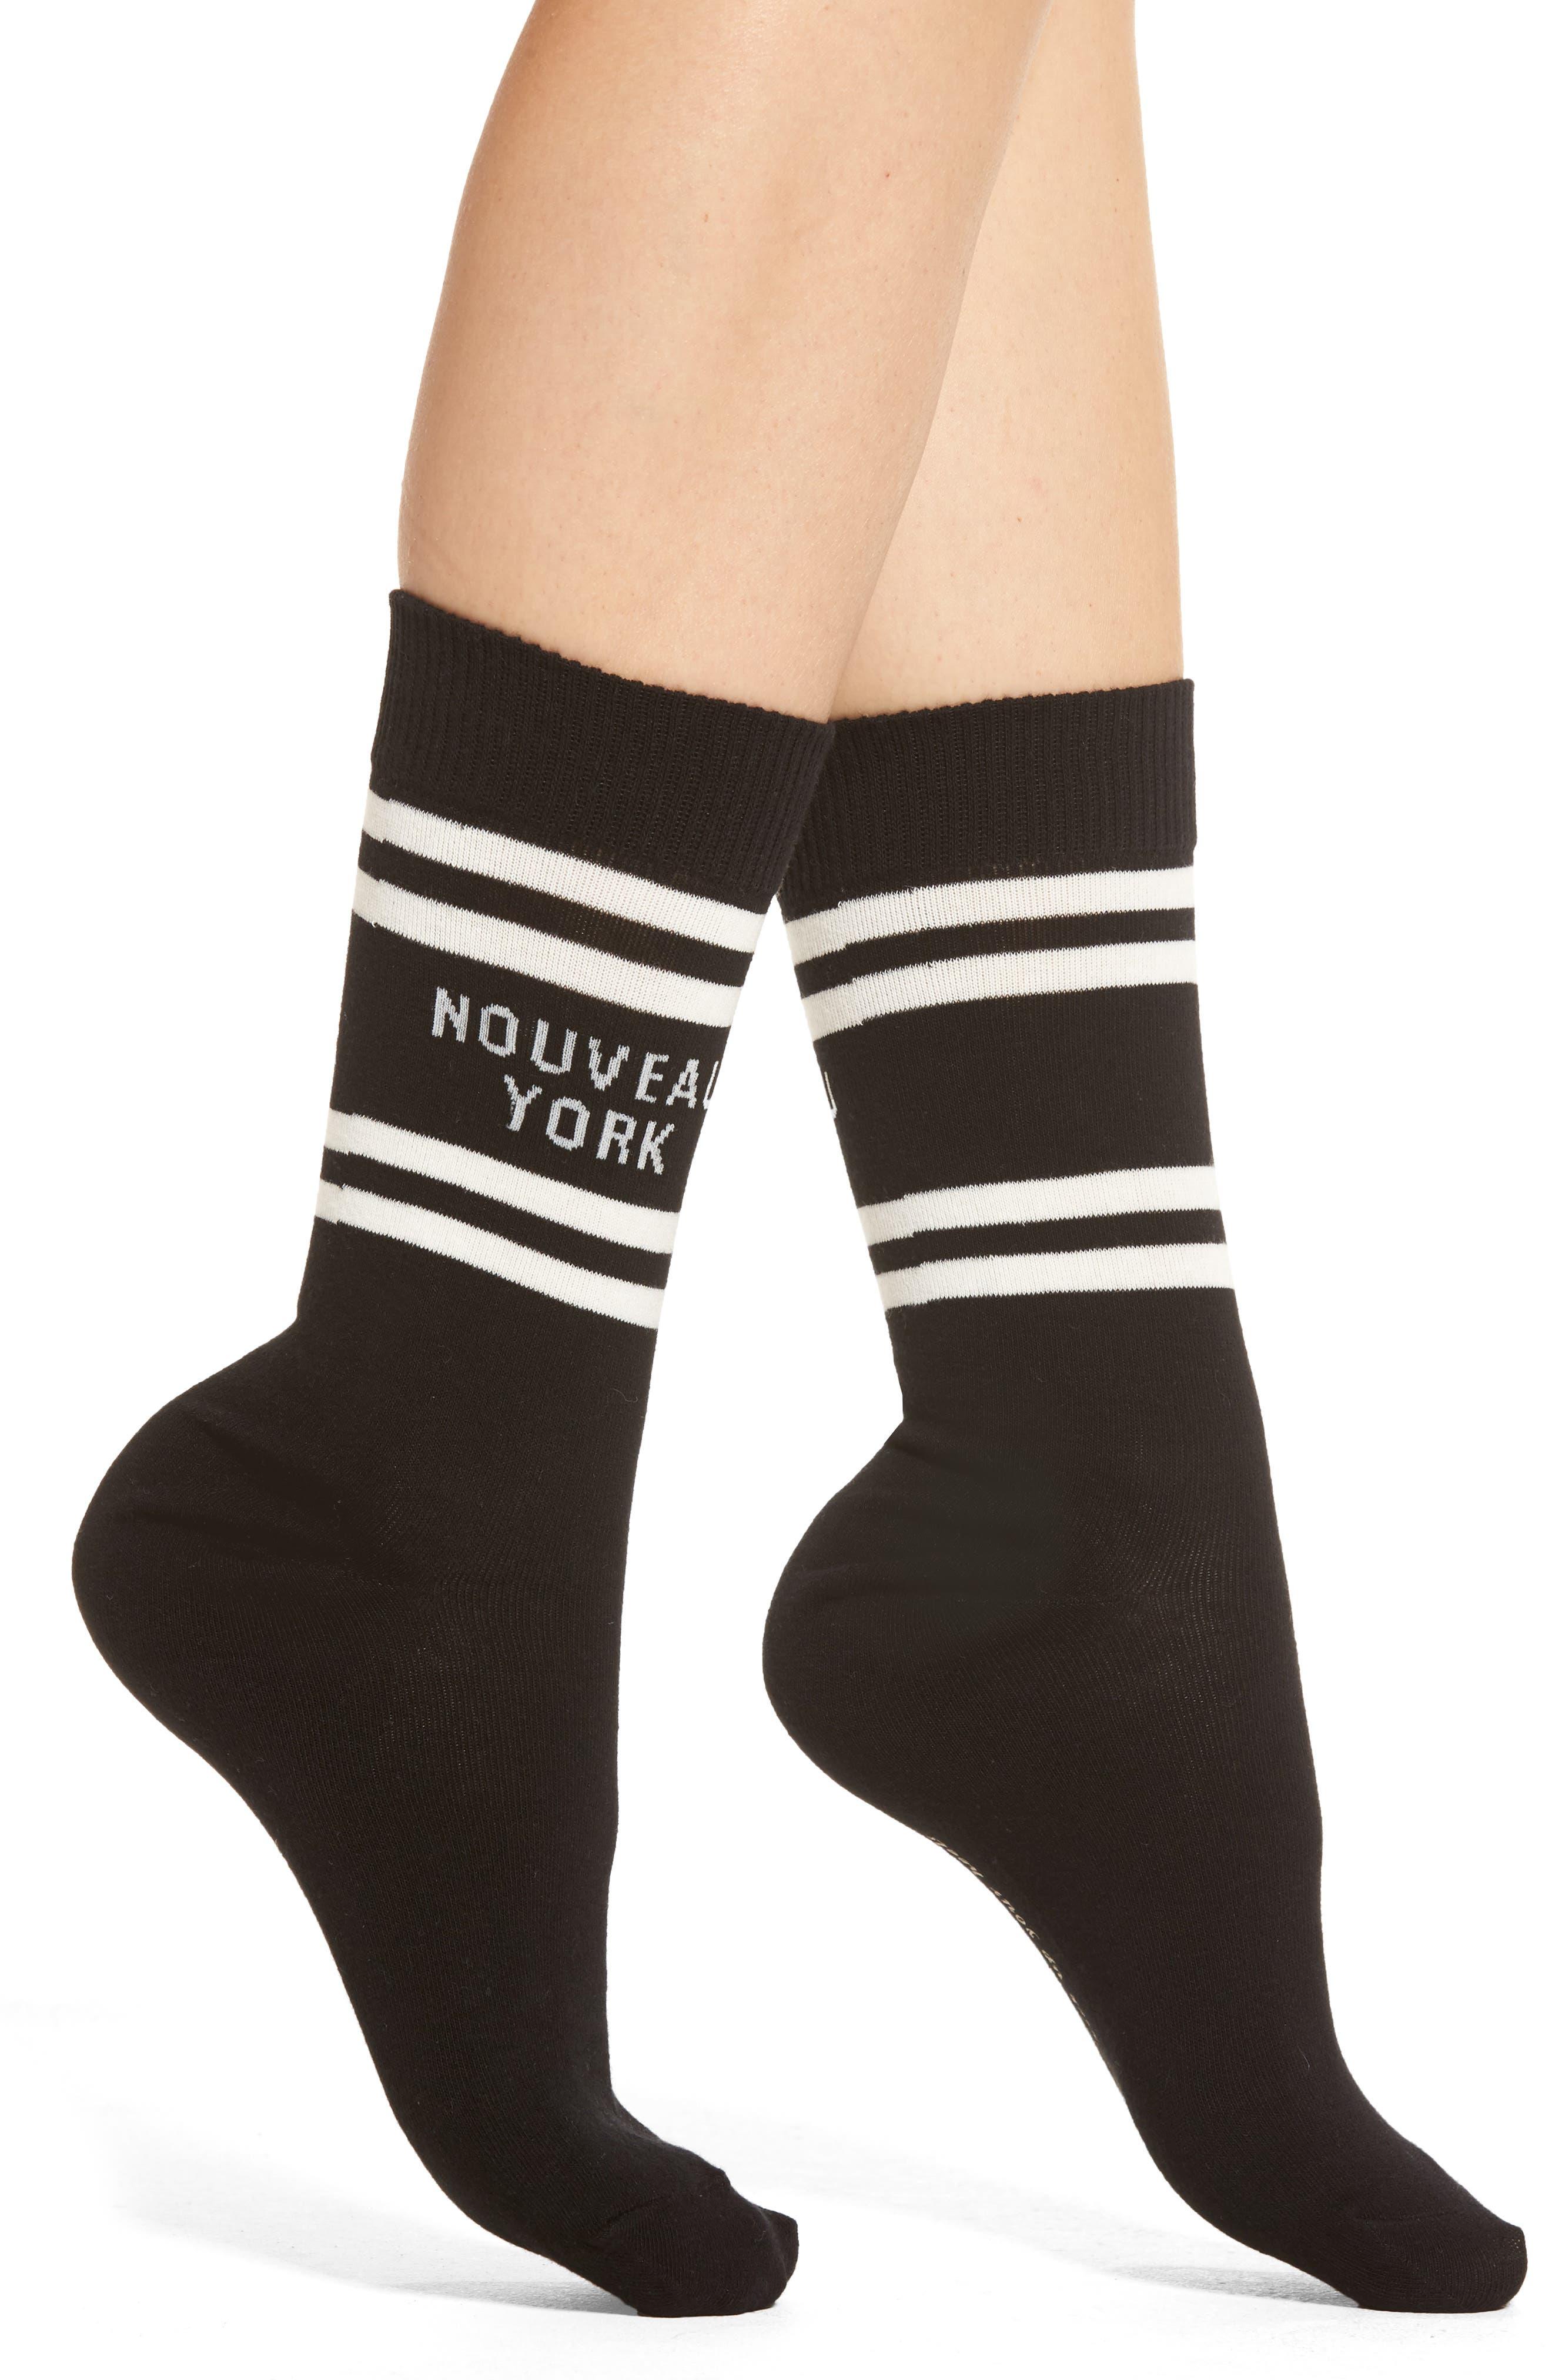 Alternate Image 1 Selected - kate spade new york nouveau york crew socks